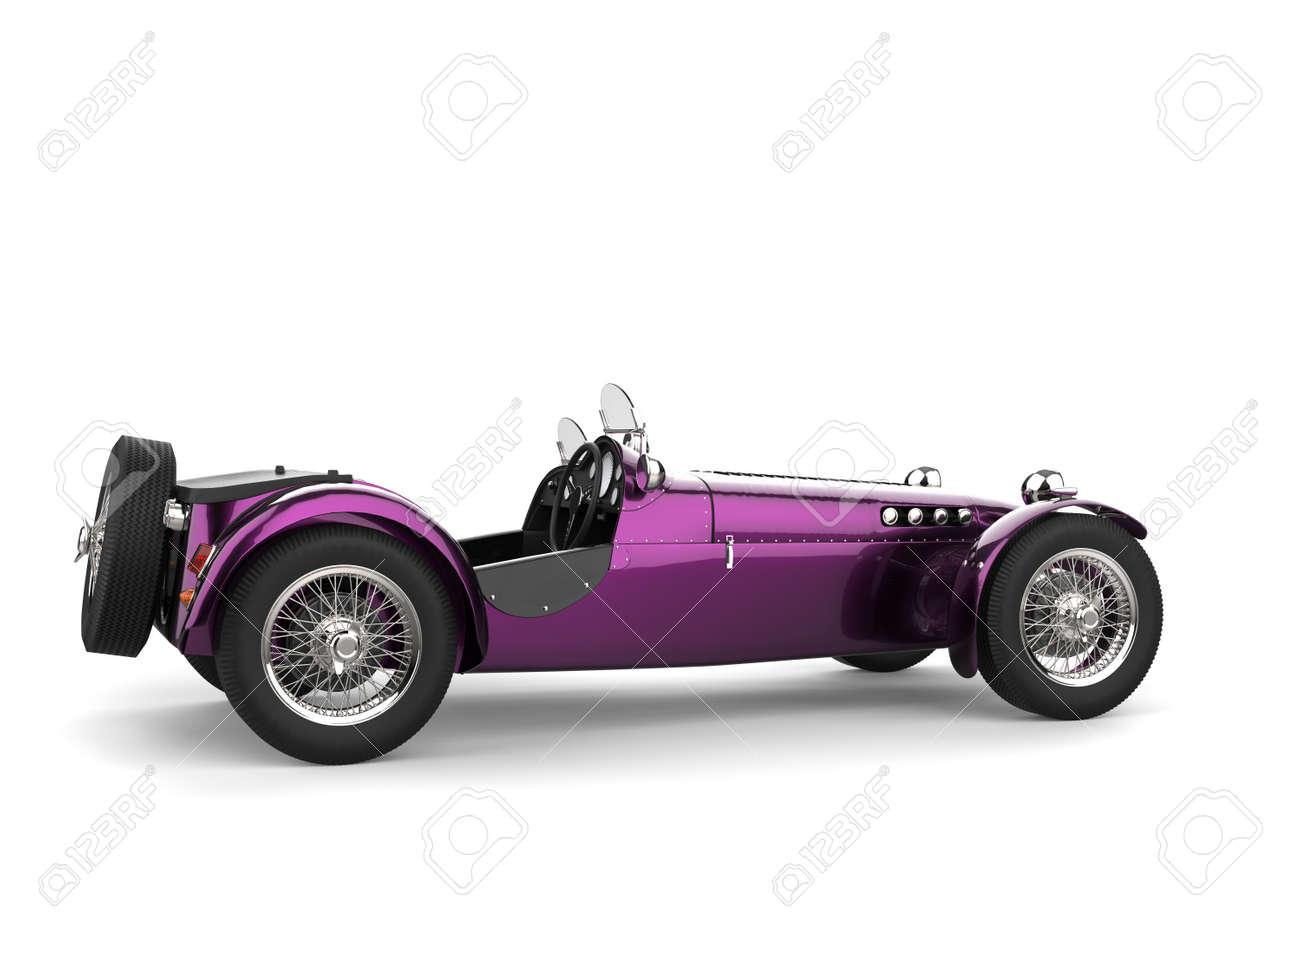 Metallic purple vintage open wheel sport racing car - 159077590